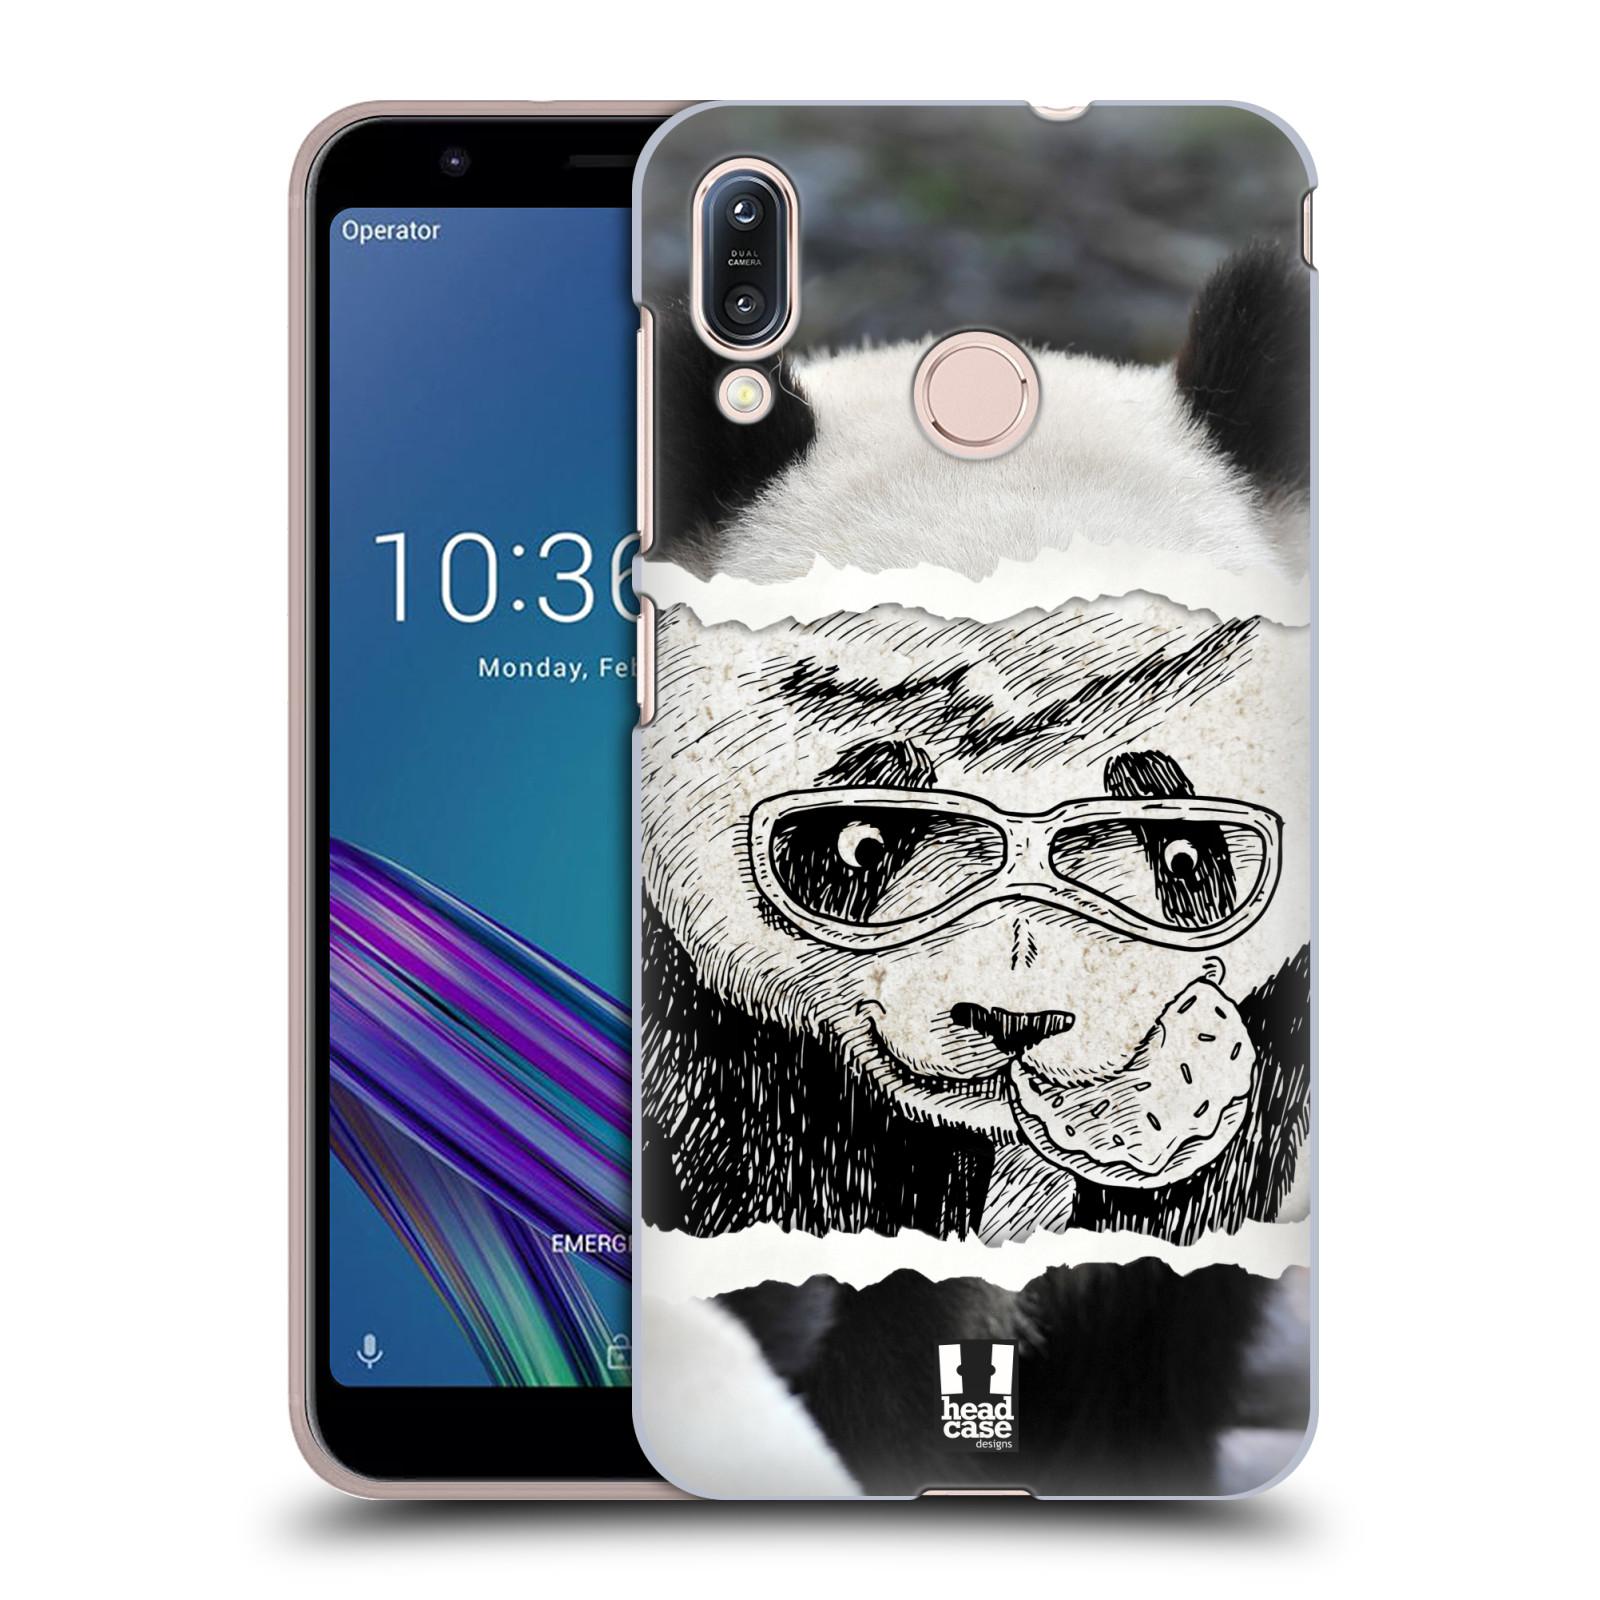 Pouzdro na mobil Asus Zenfone Max M1 (ZB555KL) - HEAD CASE - vzor zvířata koláž roztomilá panda